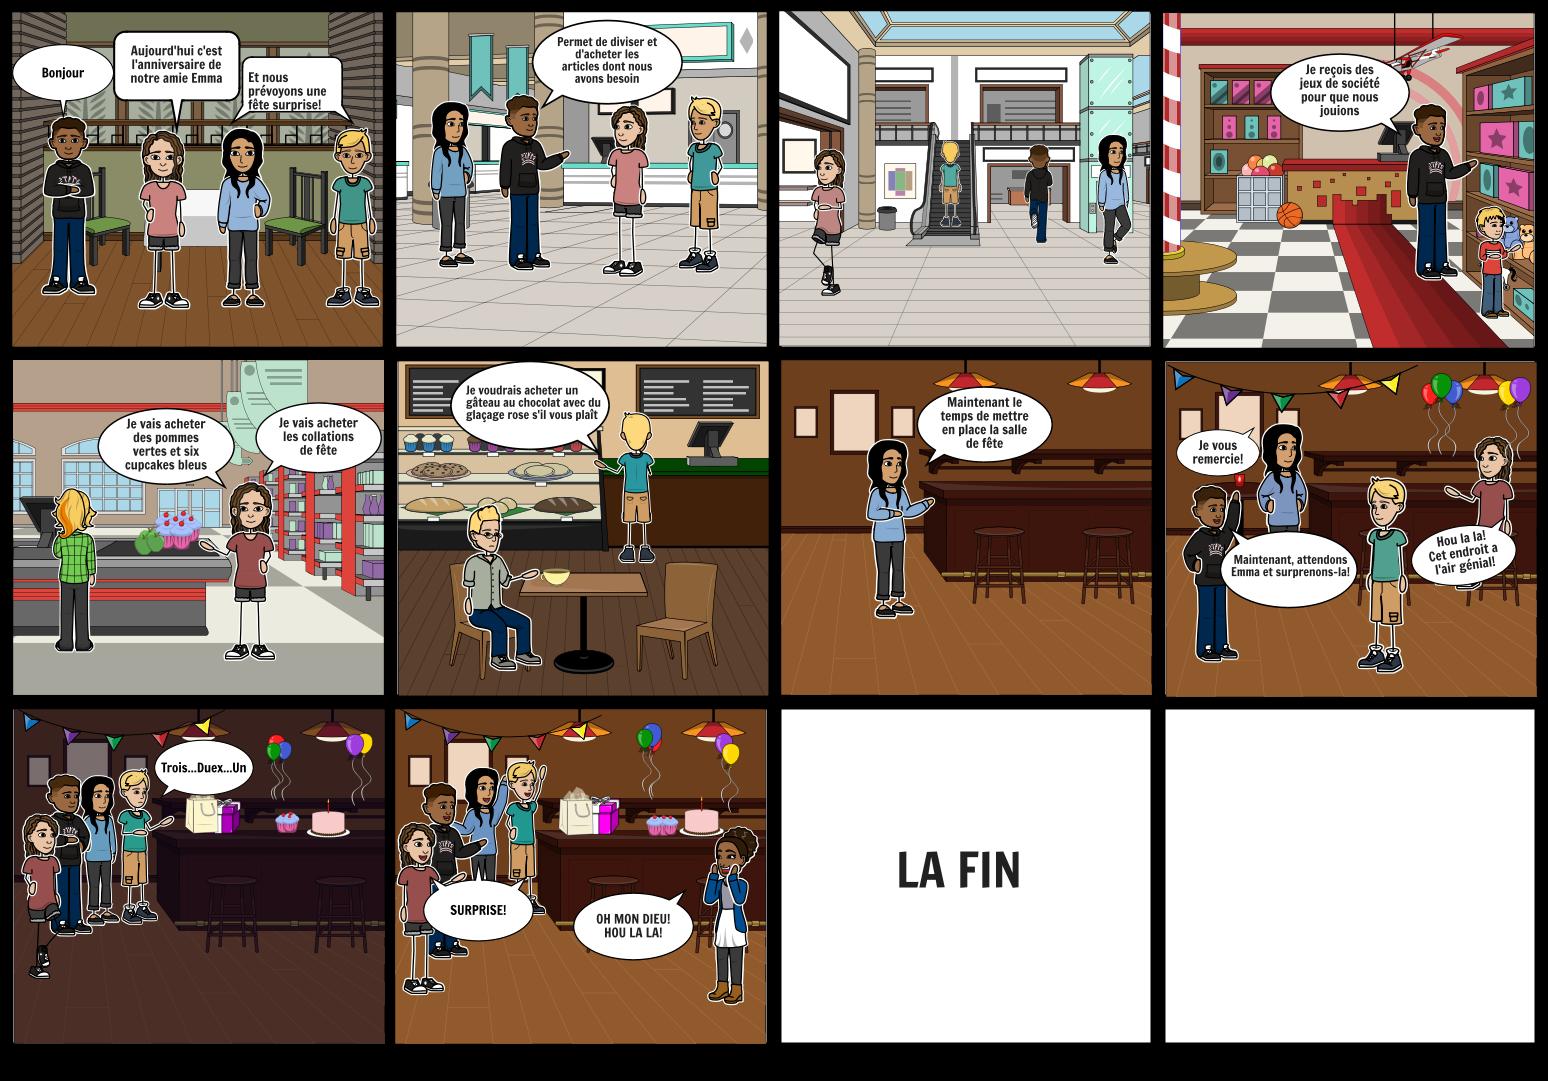 Mali's French comic